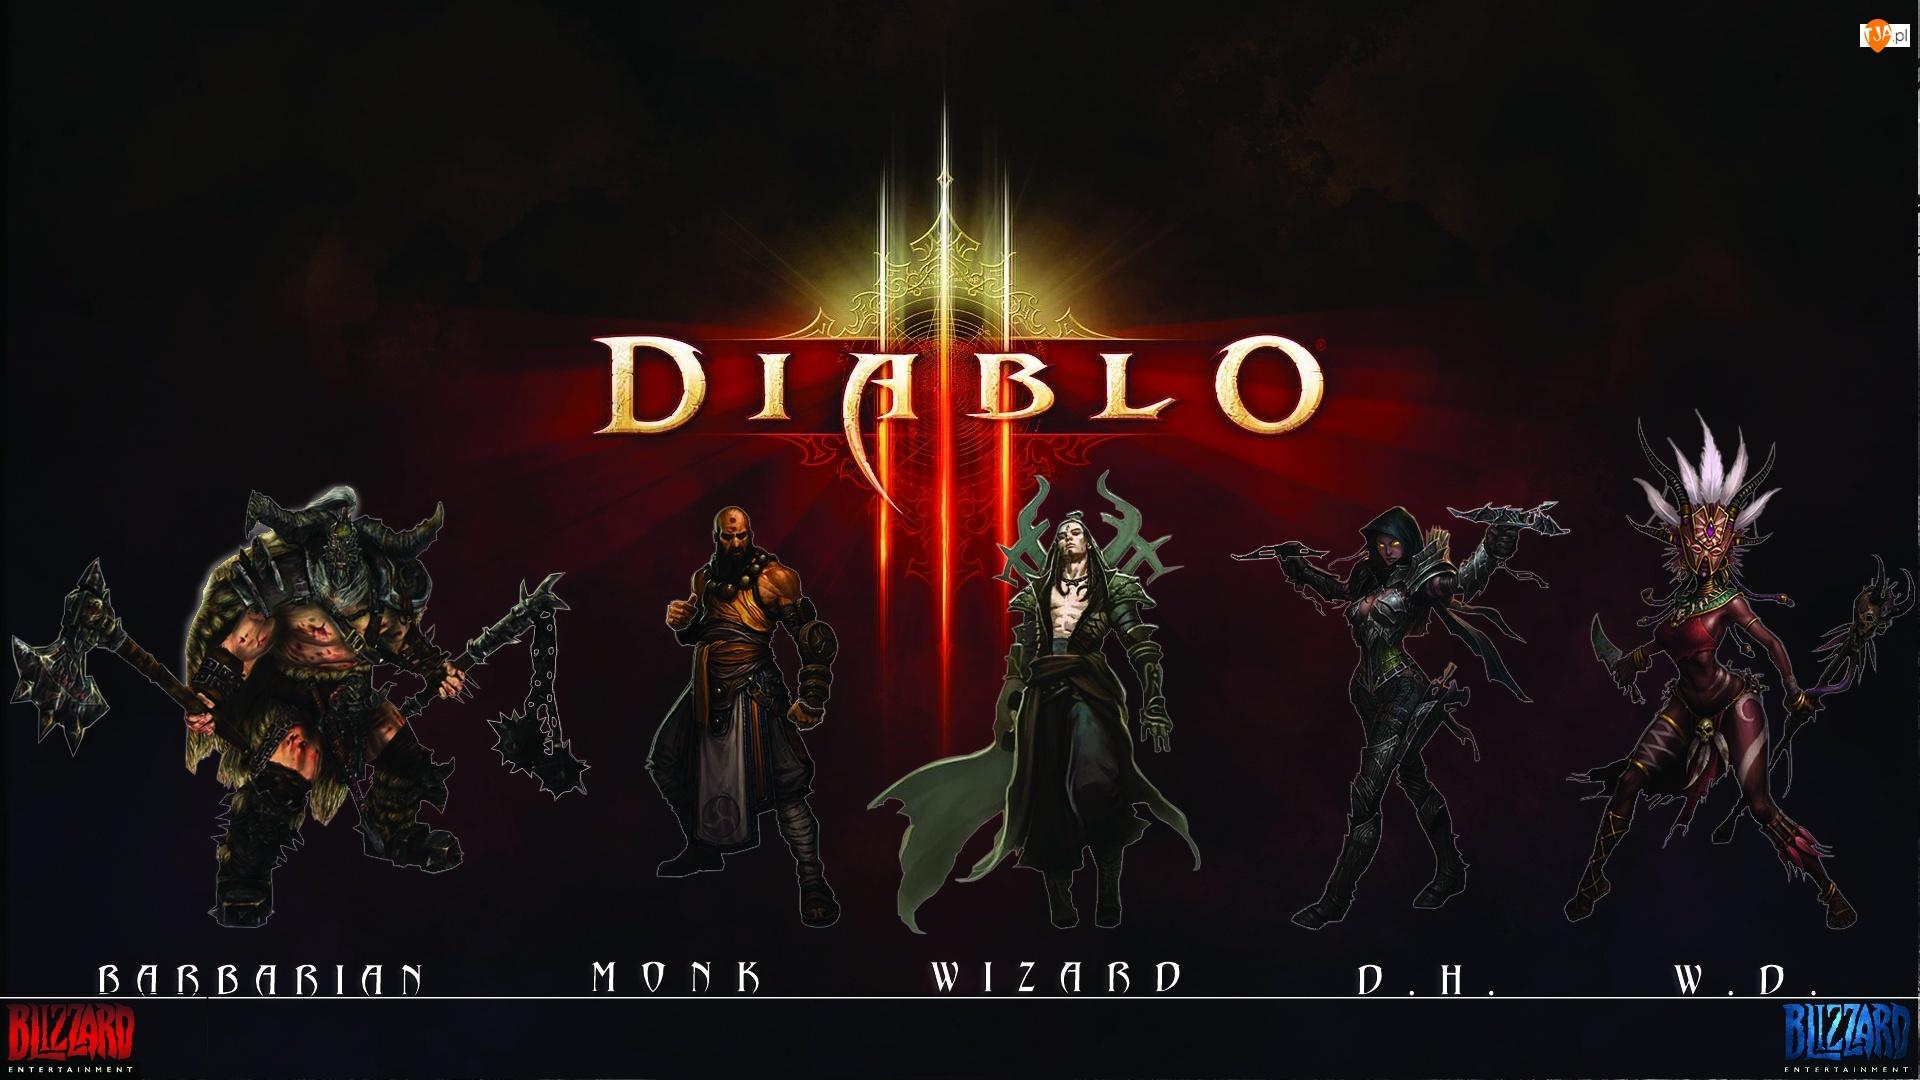 Wizard, Diablo 3, Monk